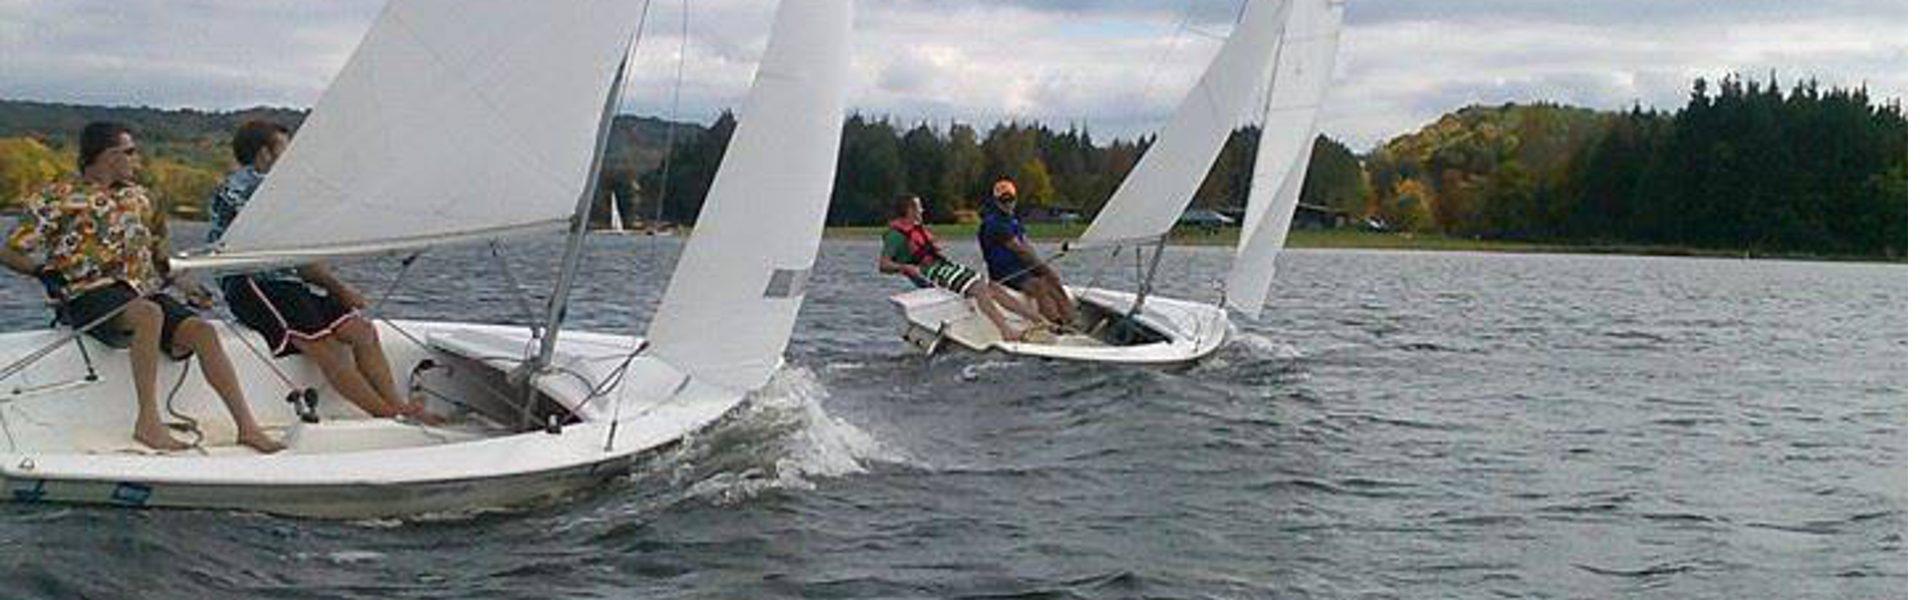 Us sailing certification 15 skills iup sailing 1betcityfo Choice Image